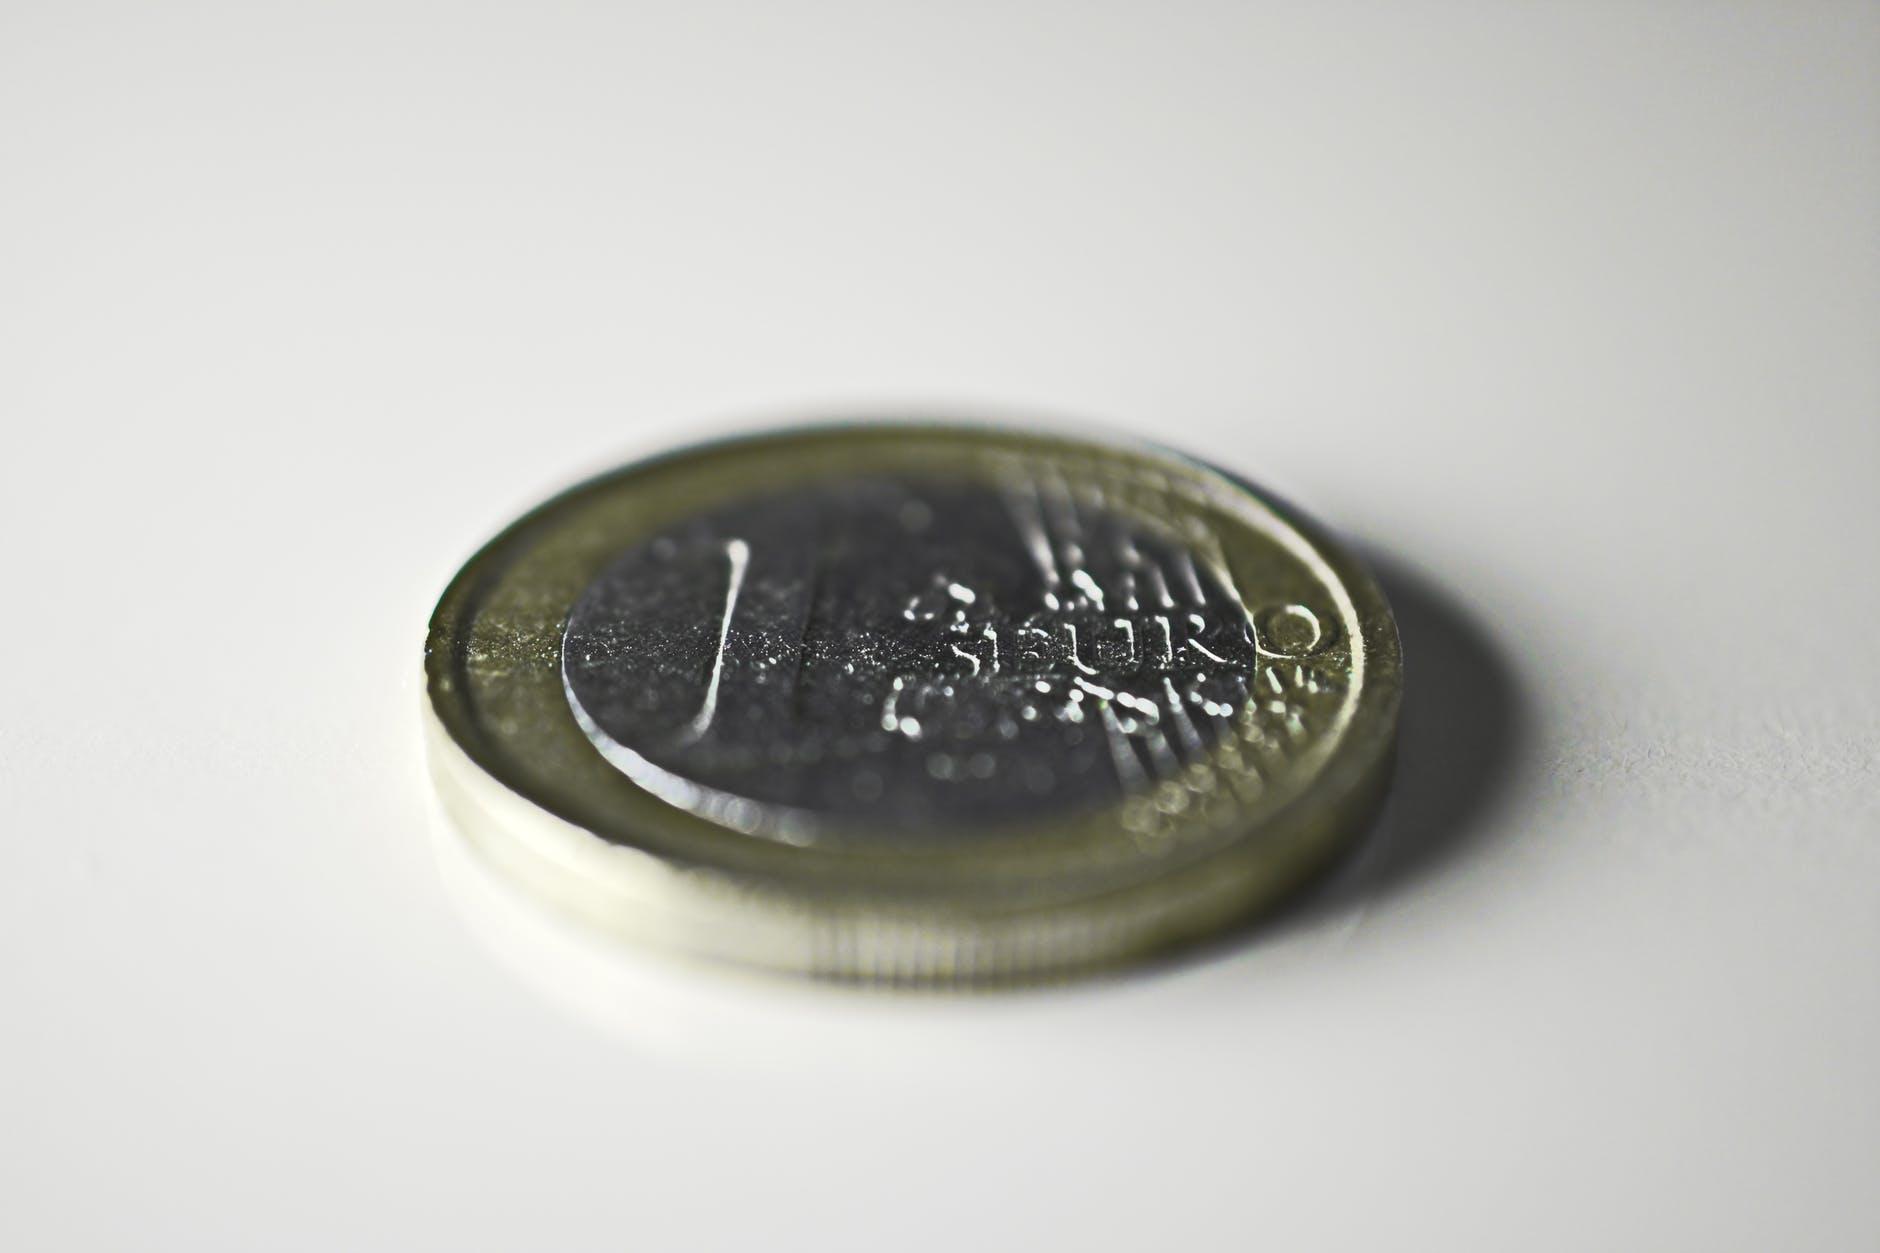 silver colored coin